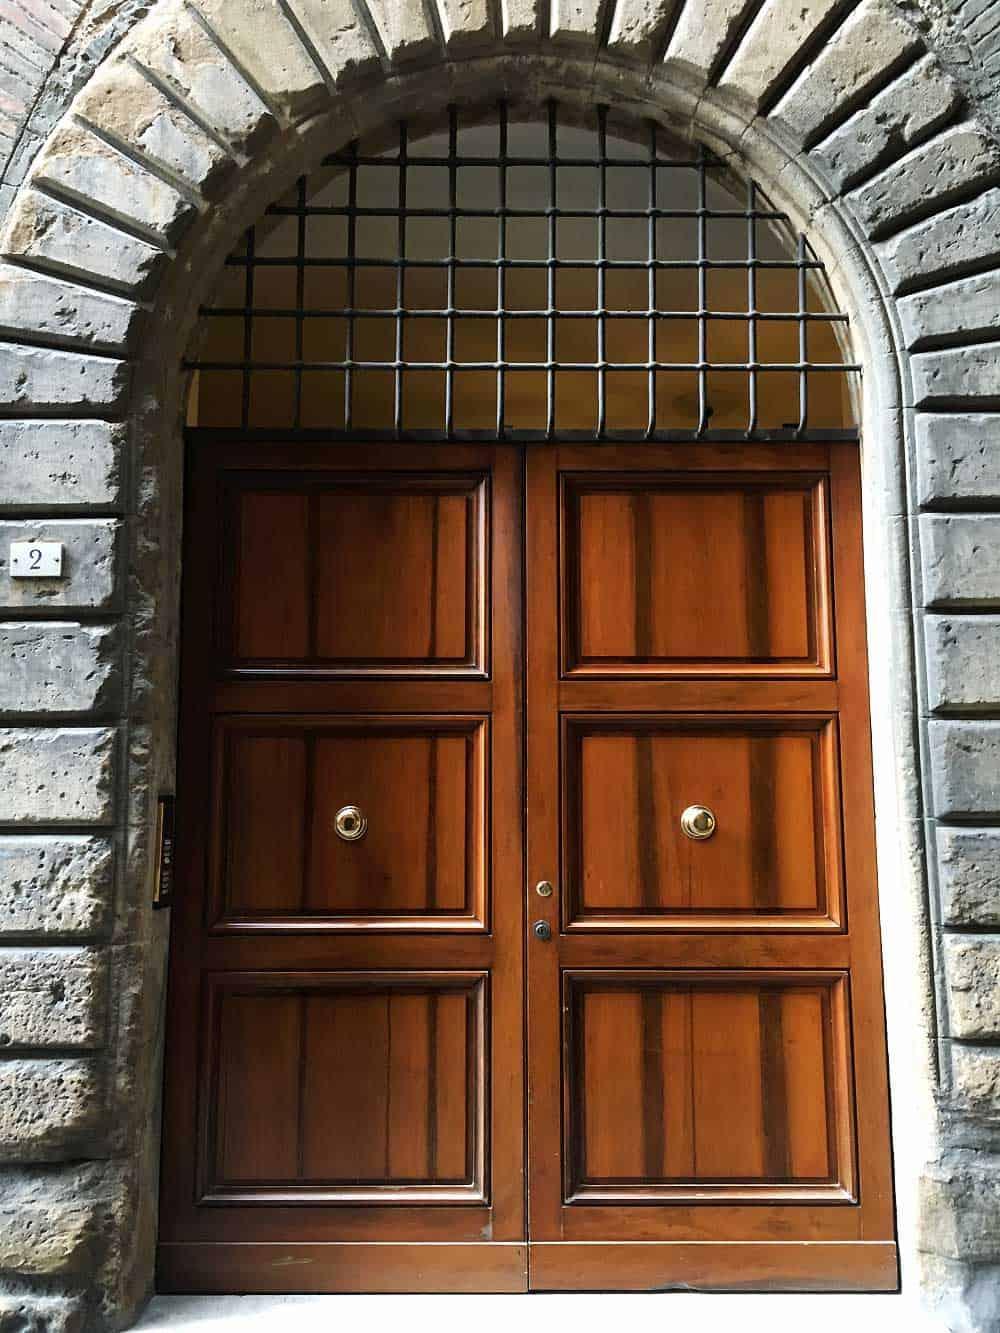 italian-doors-and-windows-31 & Stunning Windows and Doors of Italy: A Photo Blog |